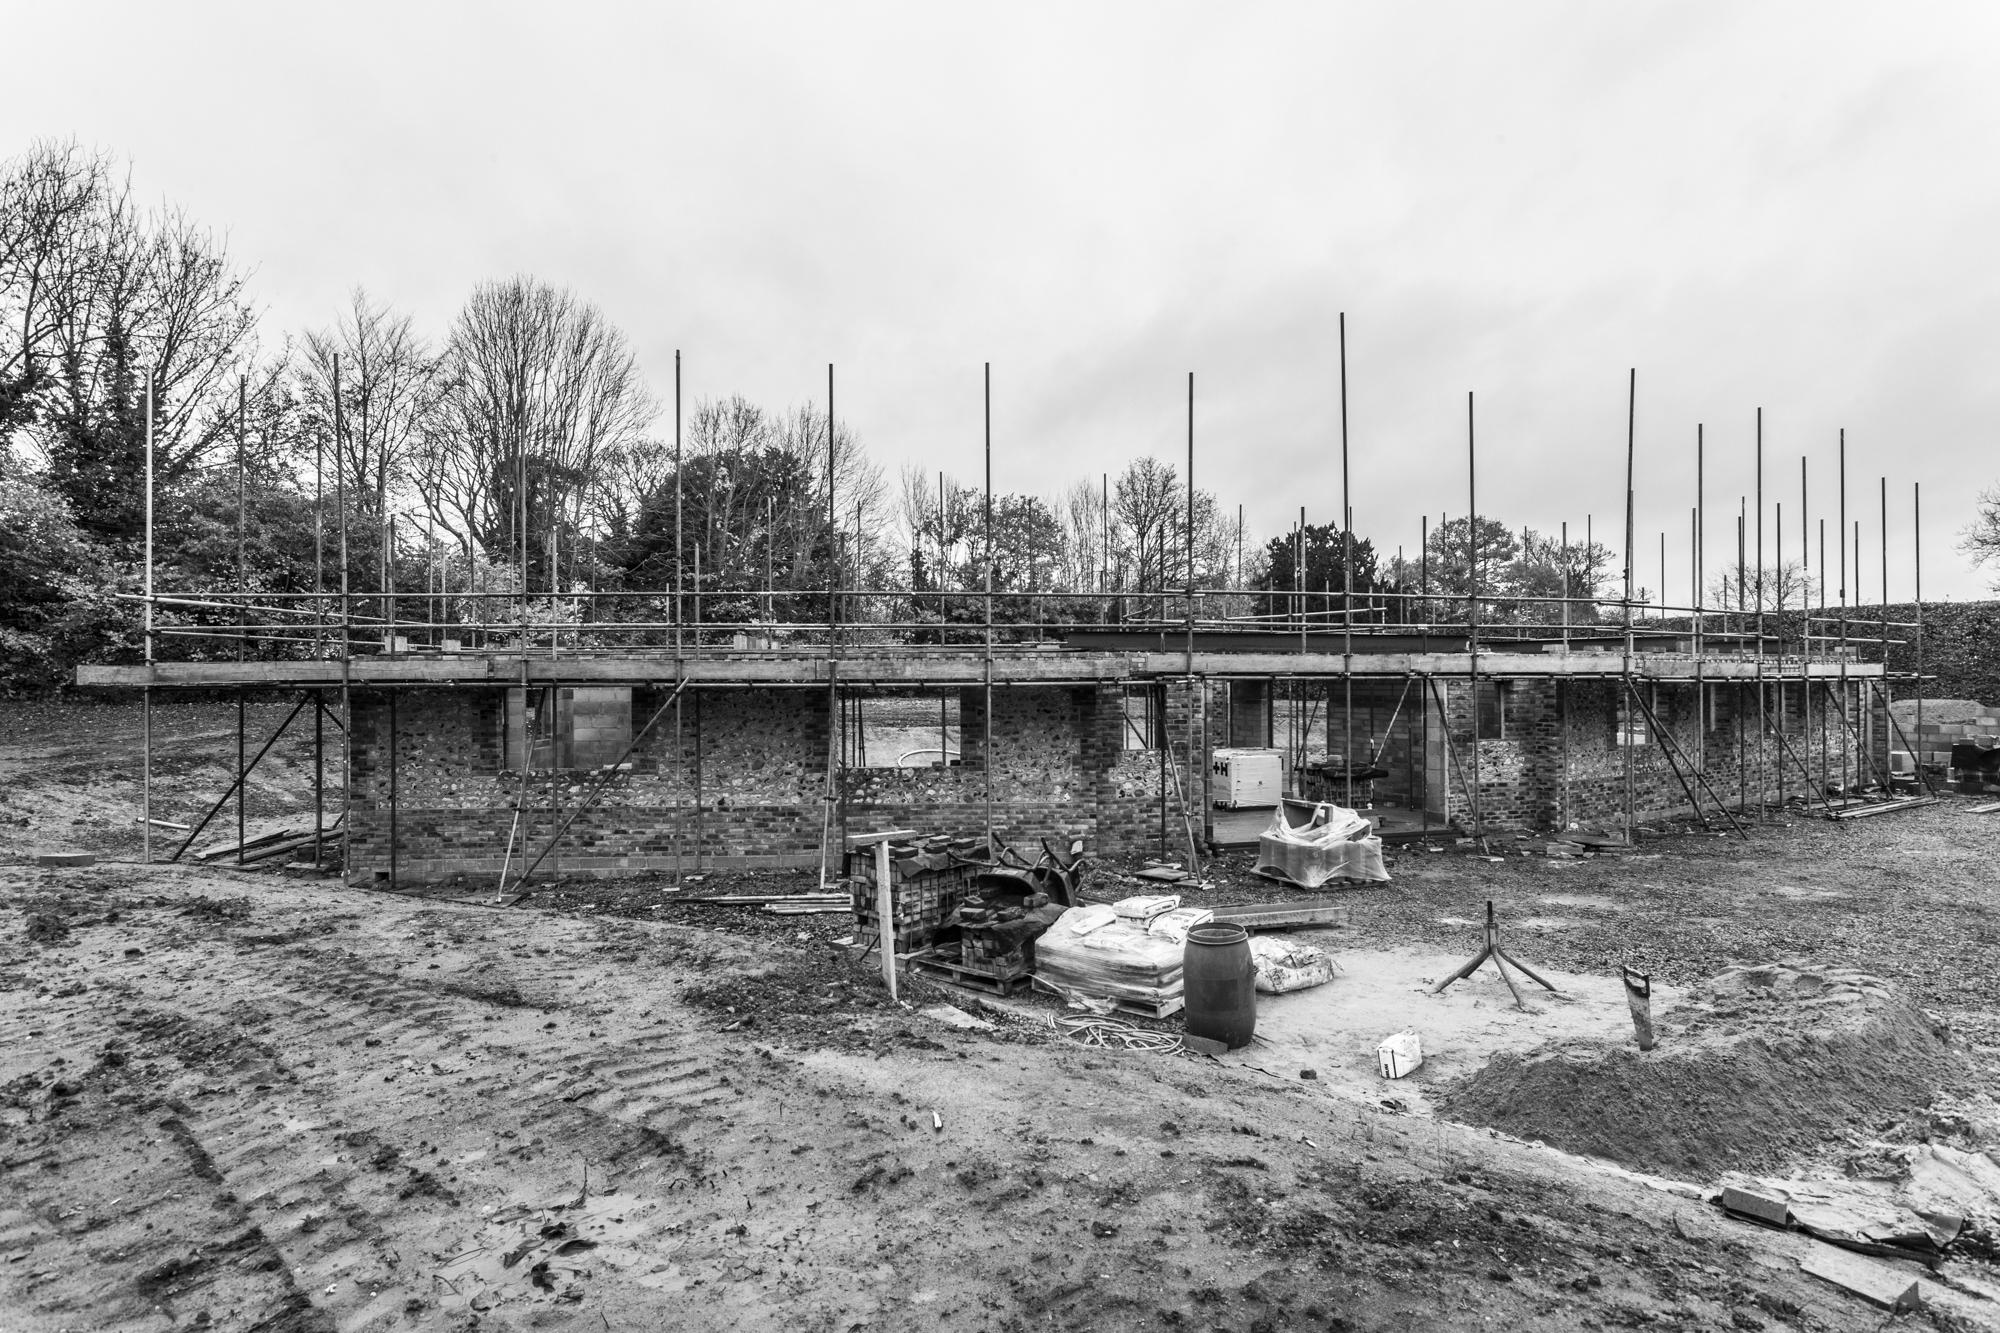 FlinthurstHouse_Construction_25.jpg